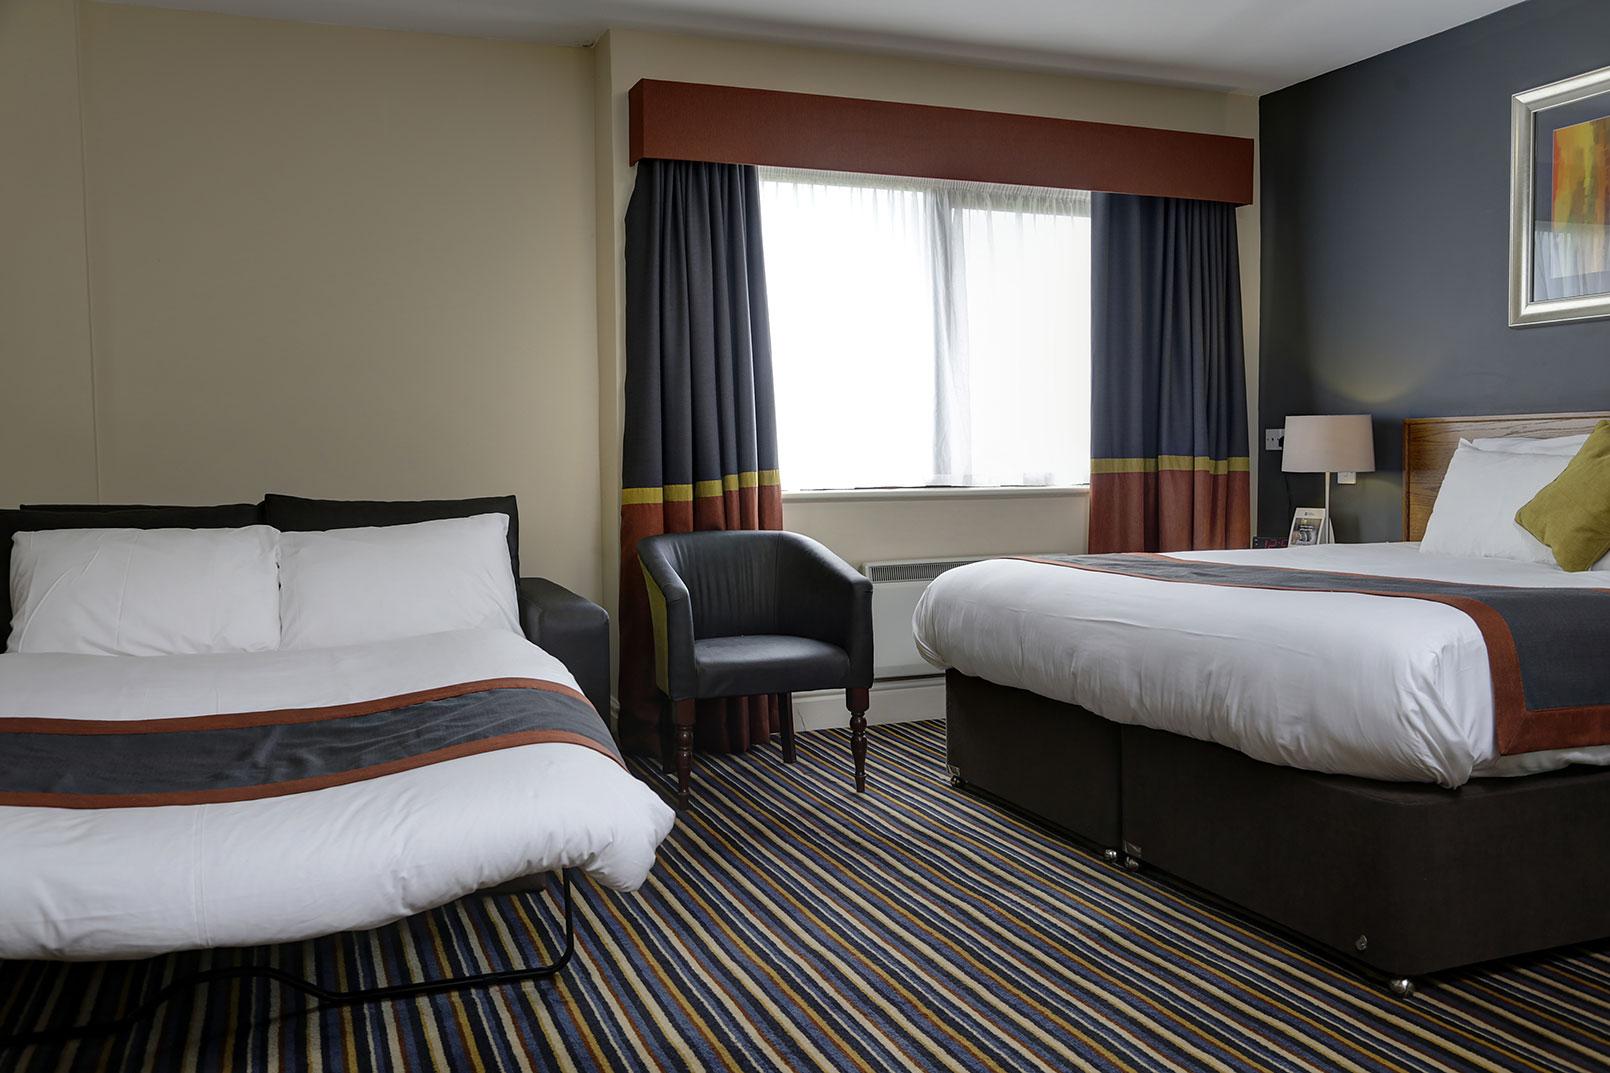 Milton Keynes Hotel Bedrooms 09 83989